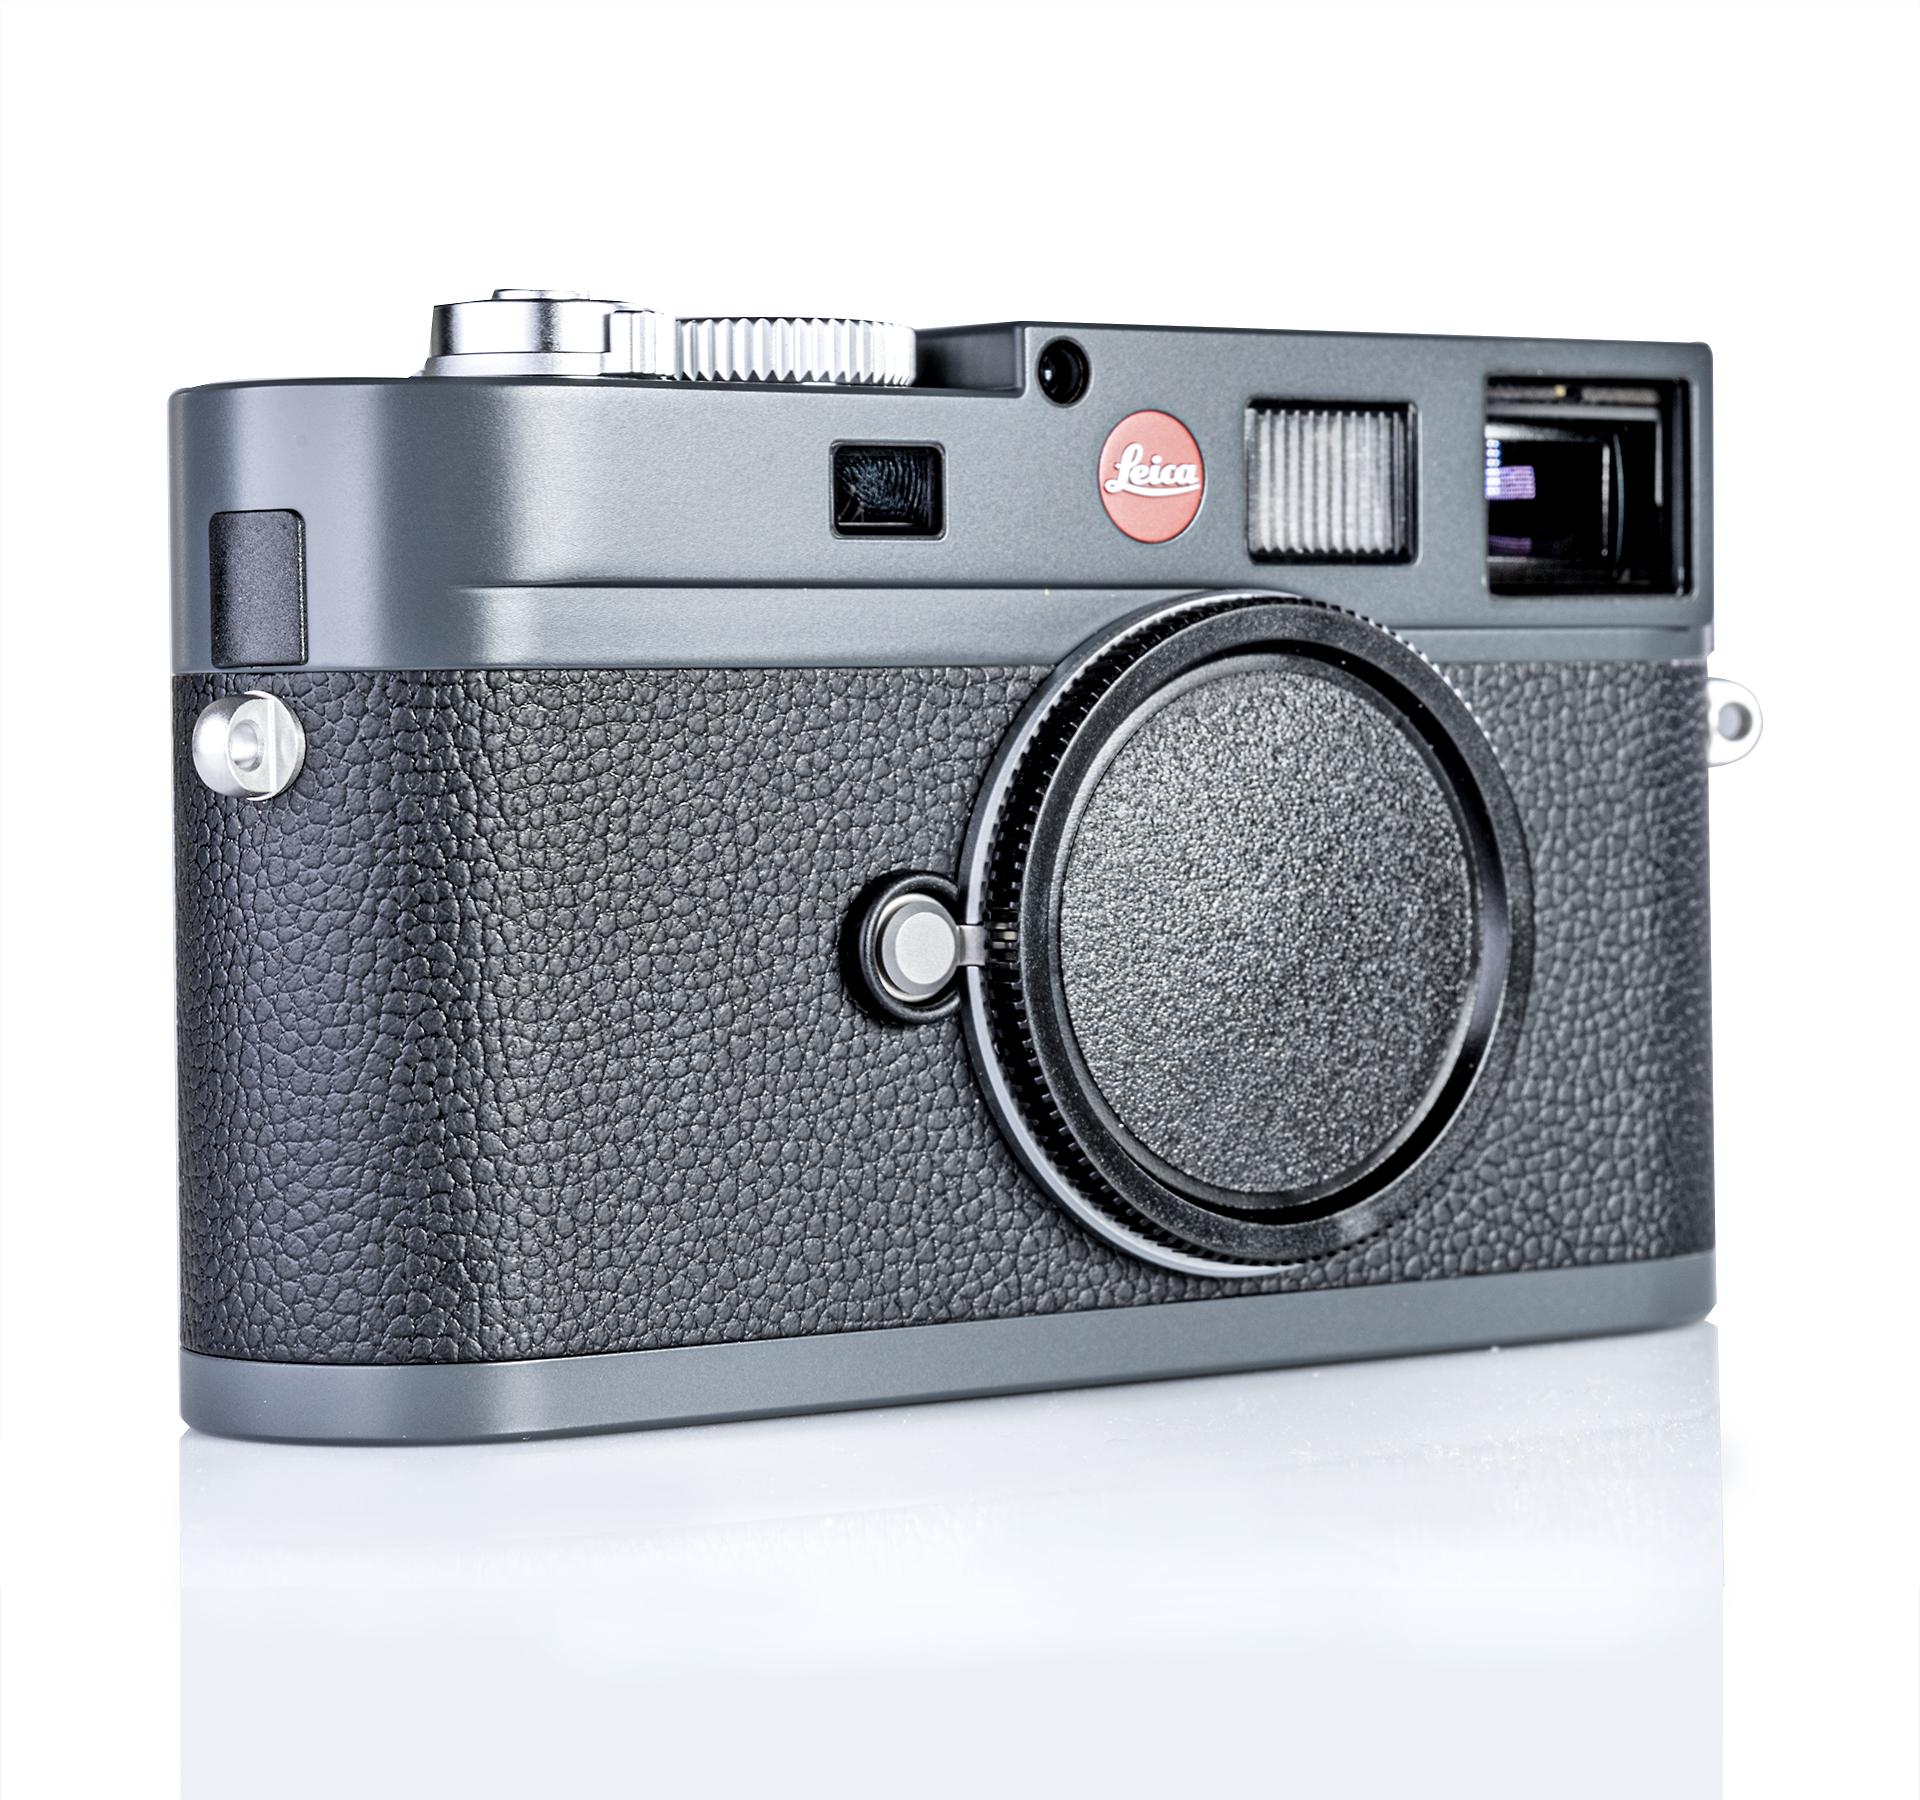 Gelegenheiten Leica M-E (220)